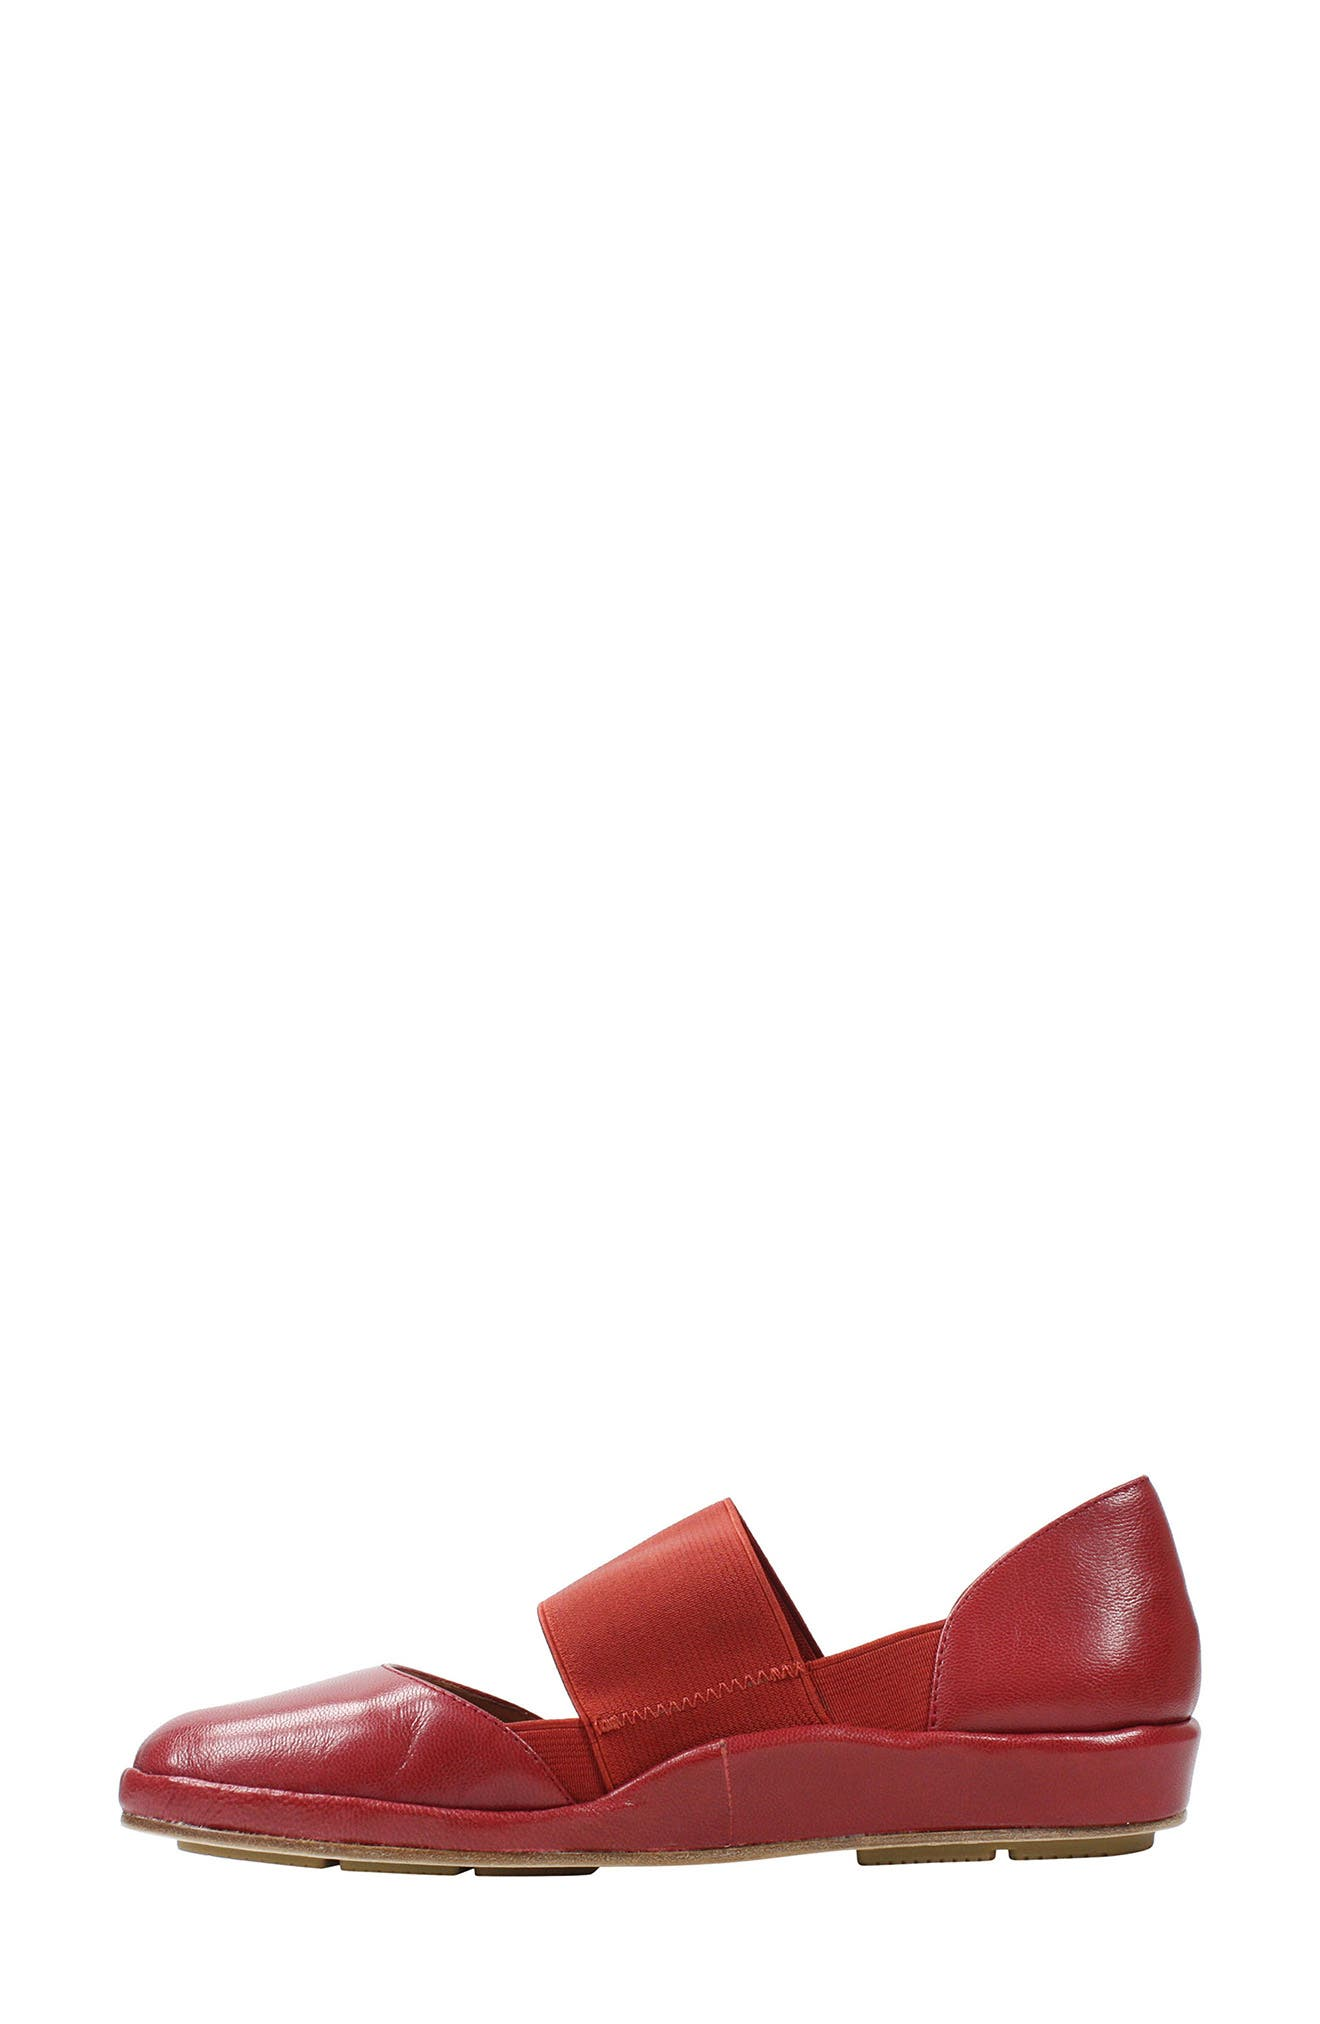 Camile Wedge Pump,                             Alternate thumbnail 4, color,                             Claret Leather